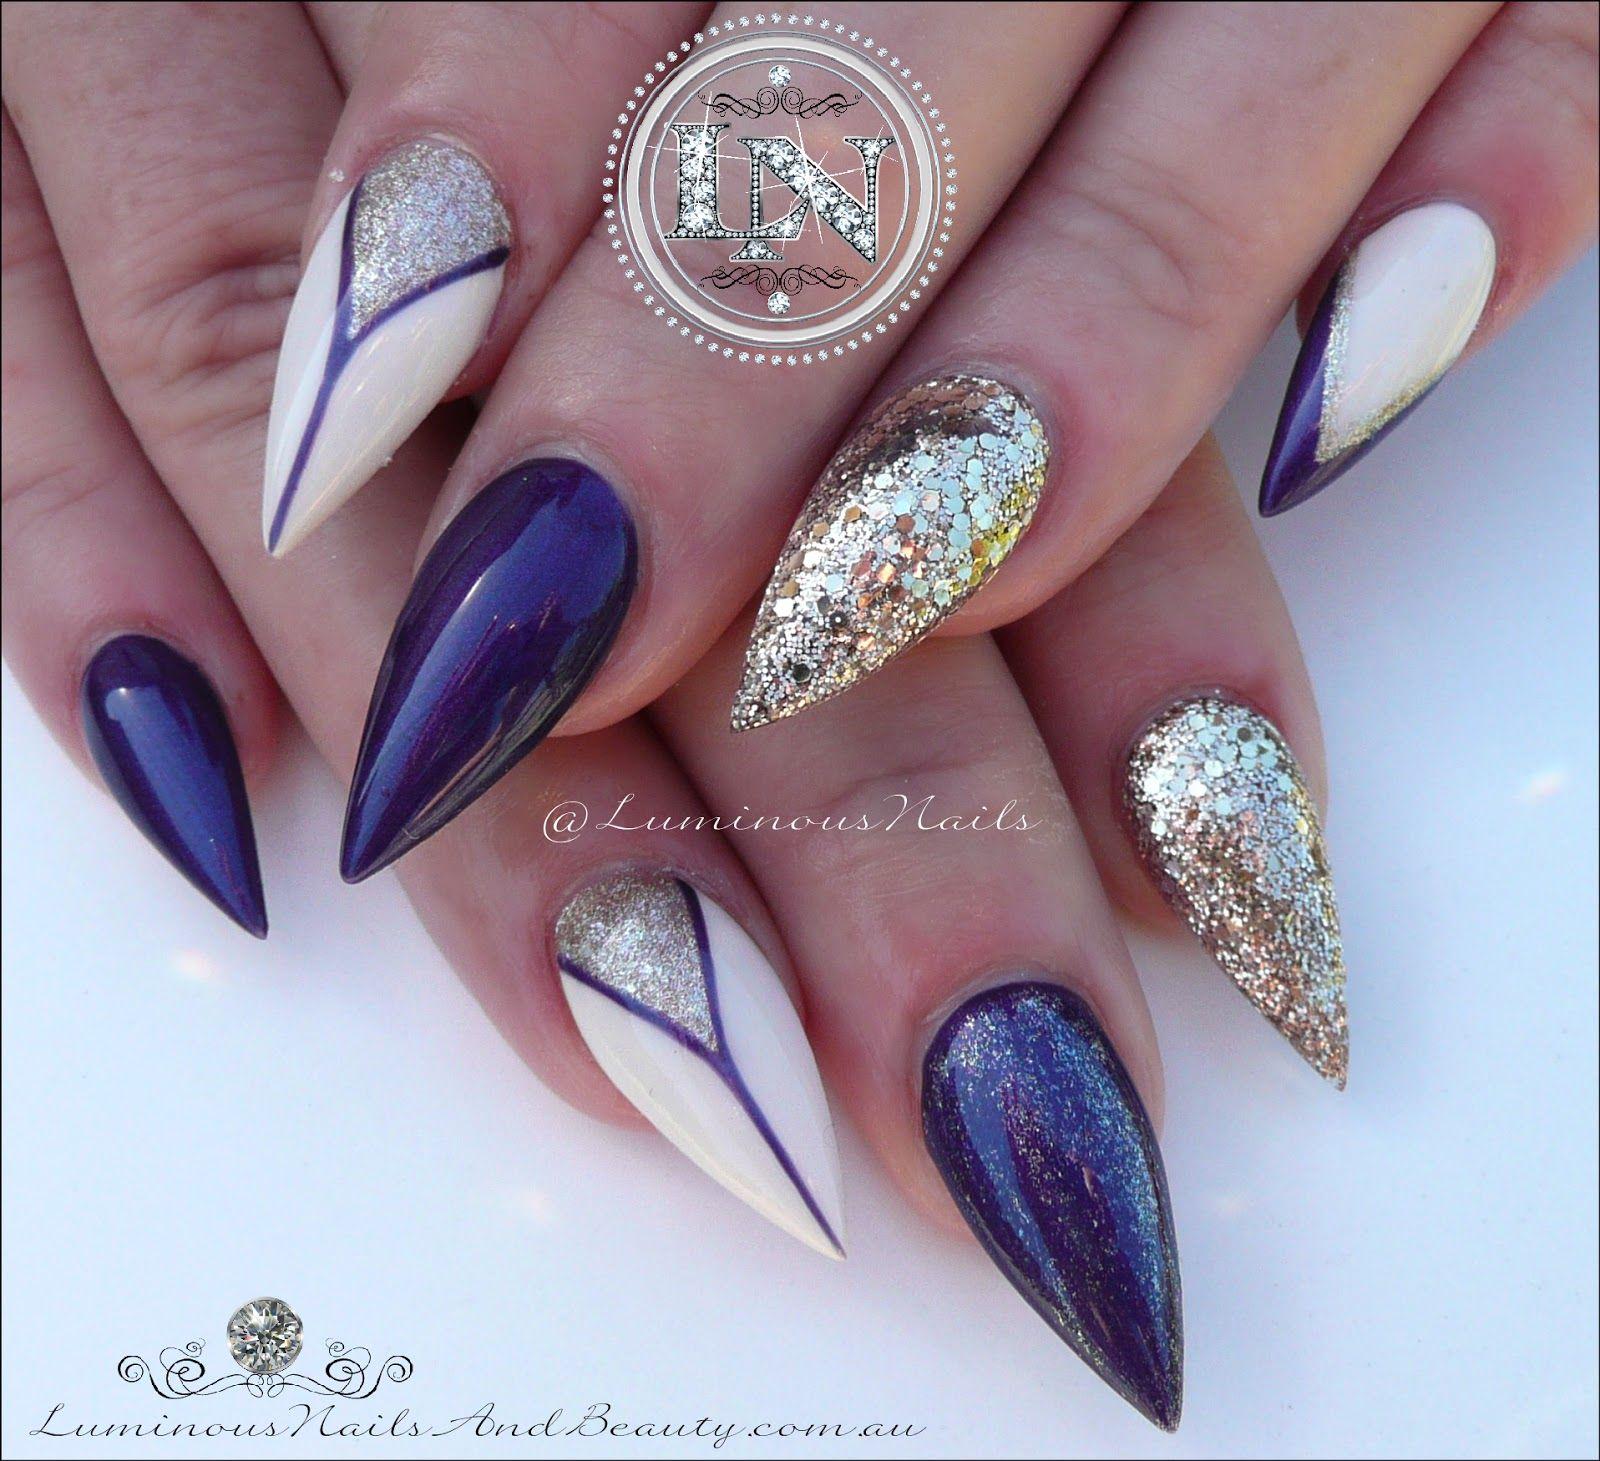 luminous nails: purple, cream & champagne gold inspired